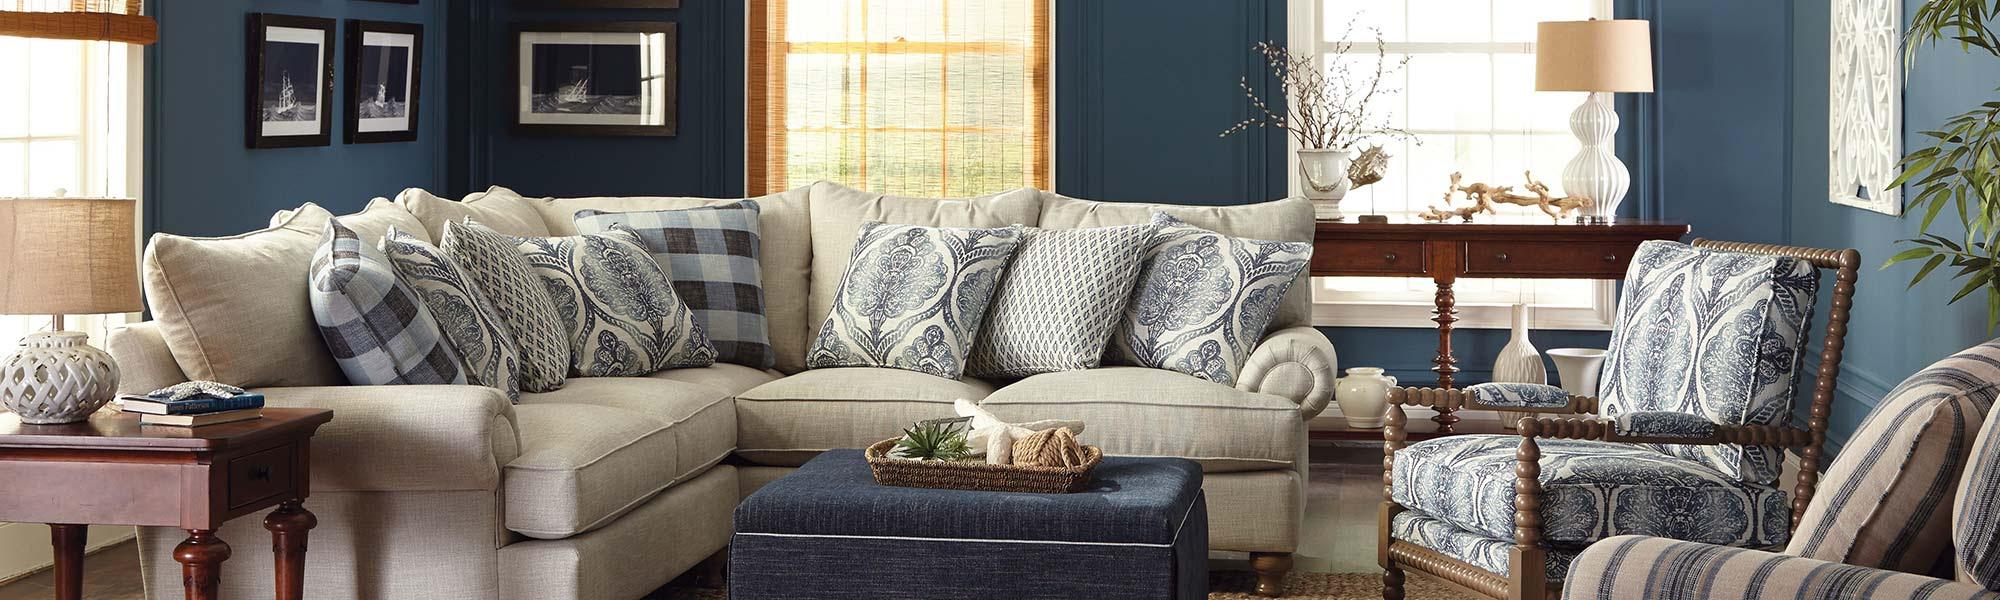 Furniture For Sale In Warner Robins Ga Phillips Furniture